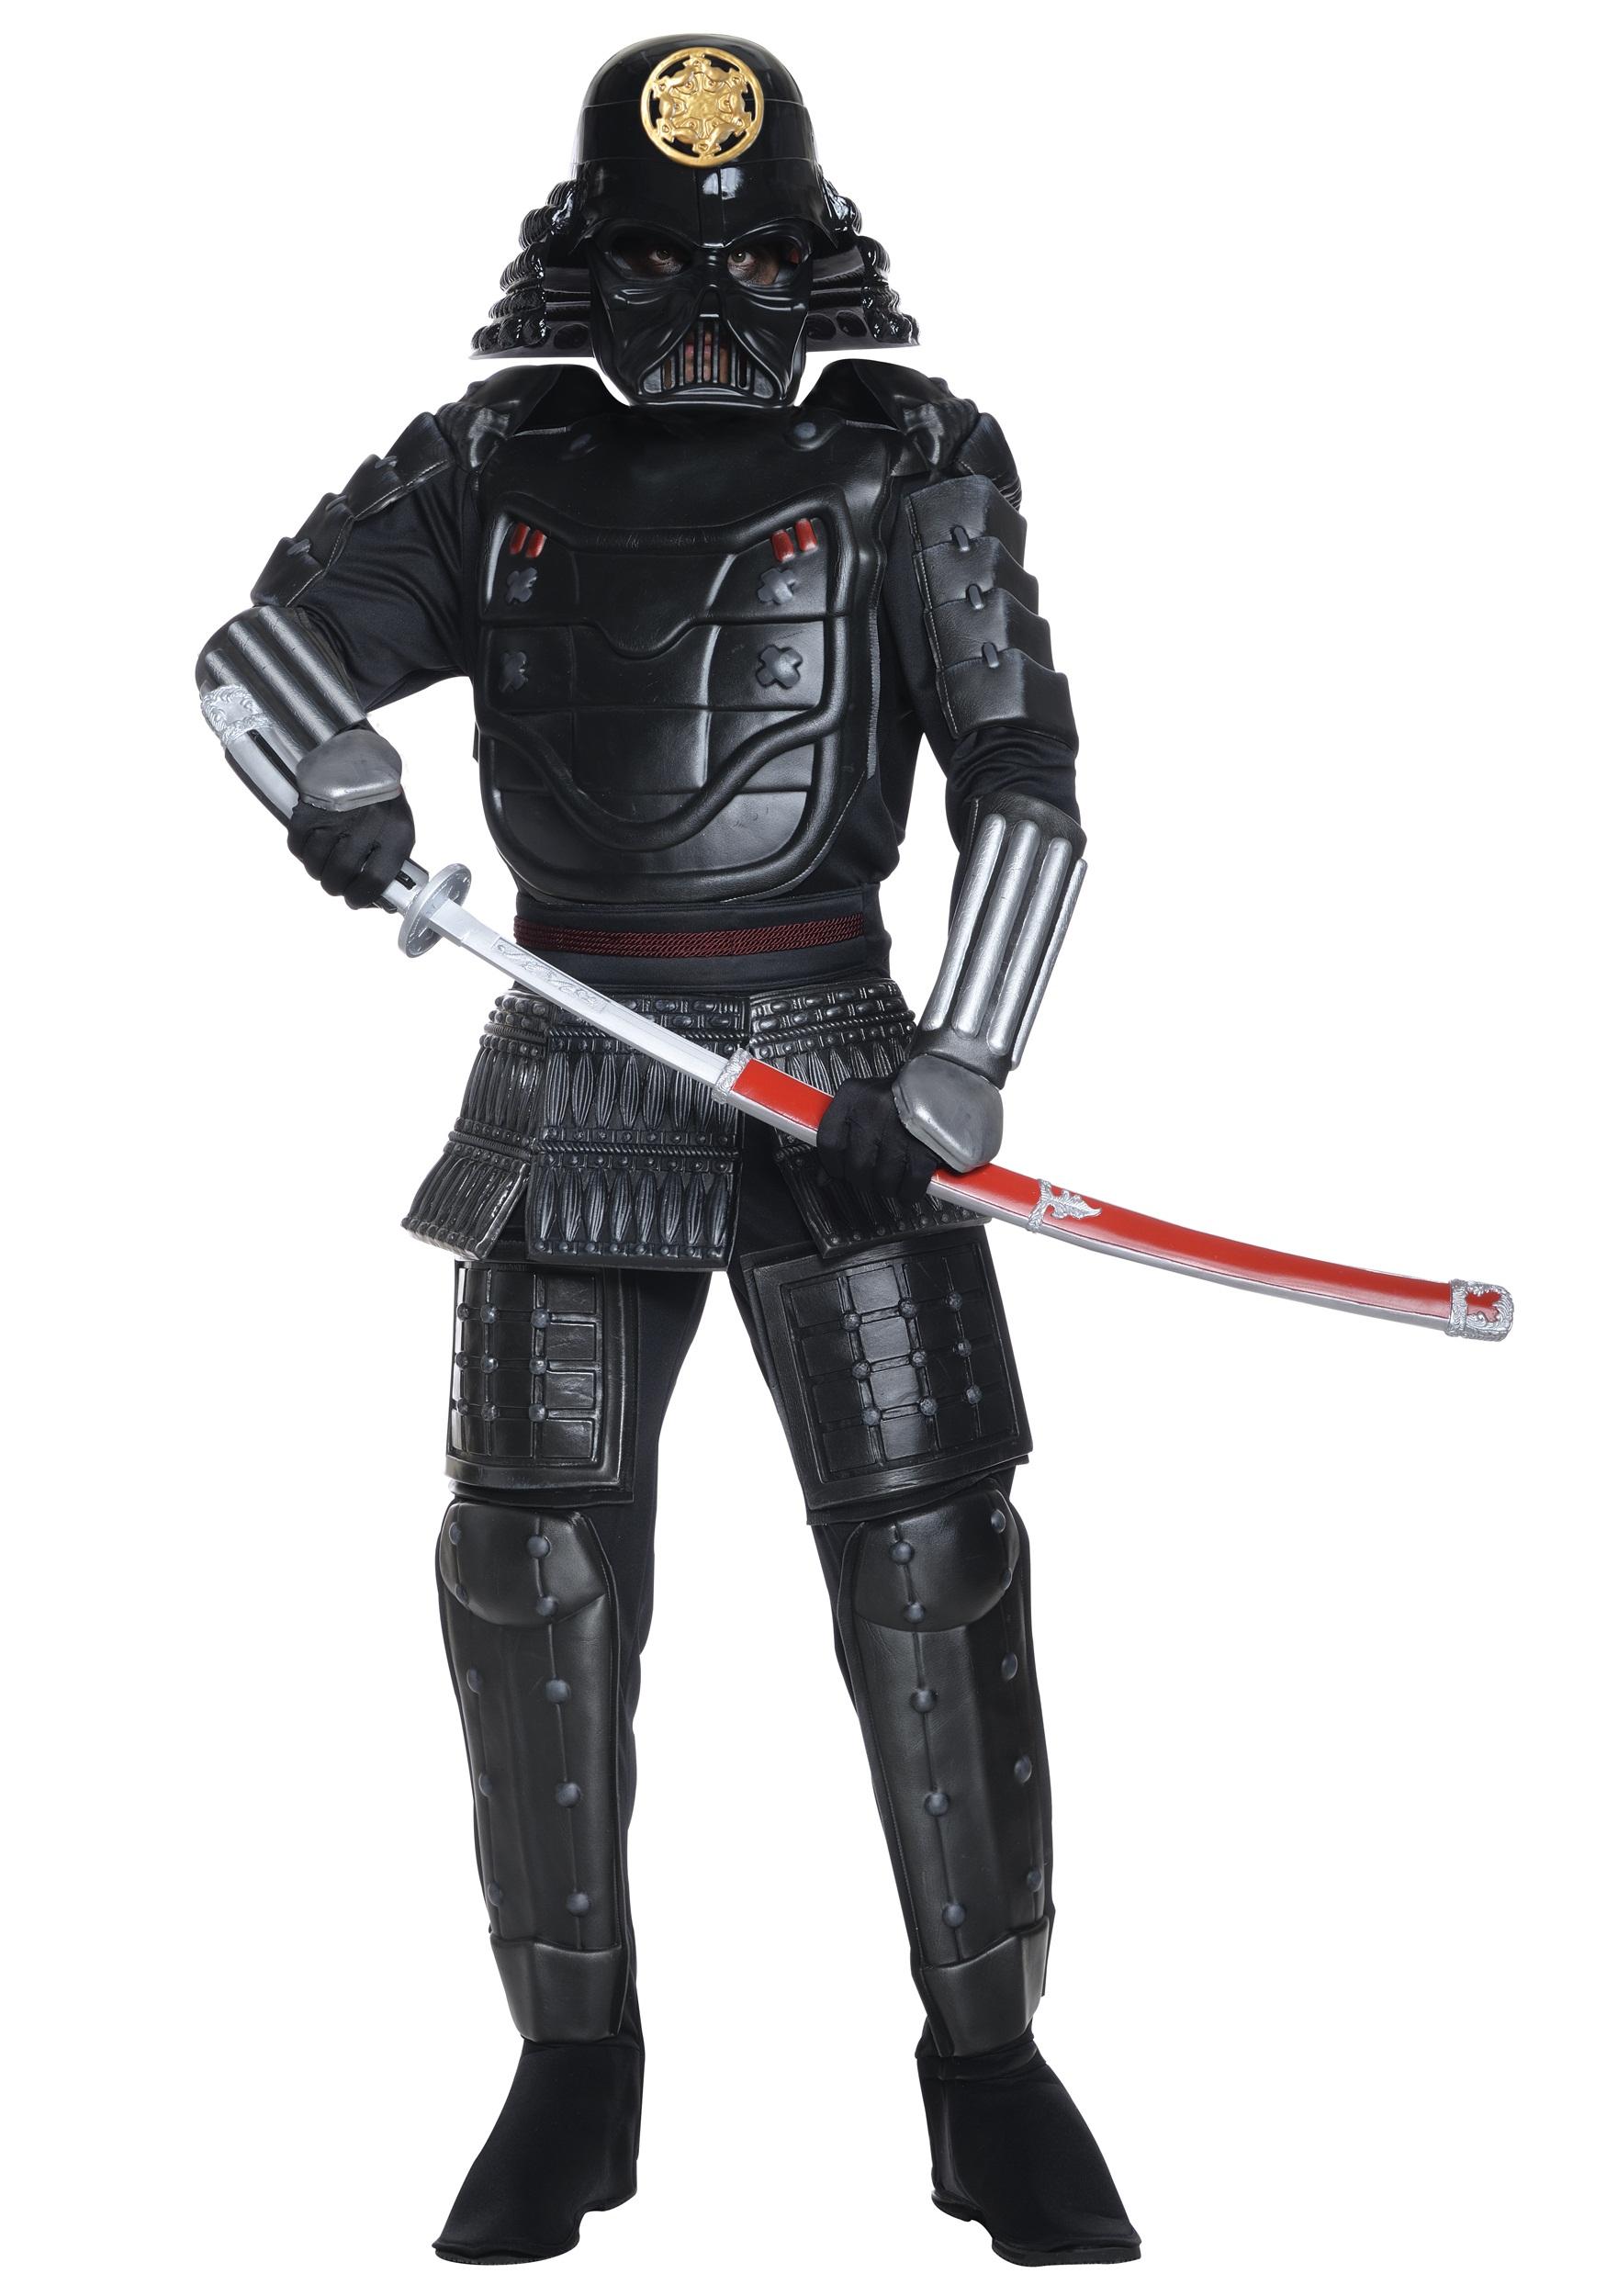 sc 1 st  Halloween Costumes UK & Samurai Darth Vader Costume